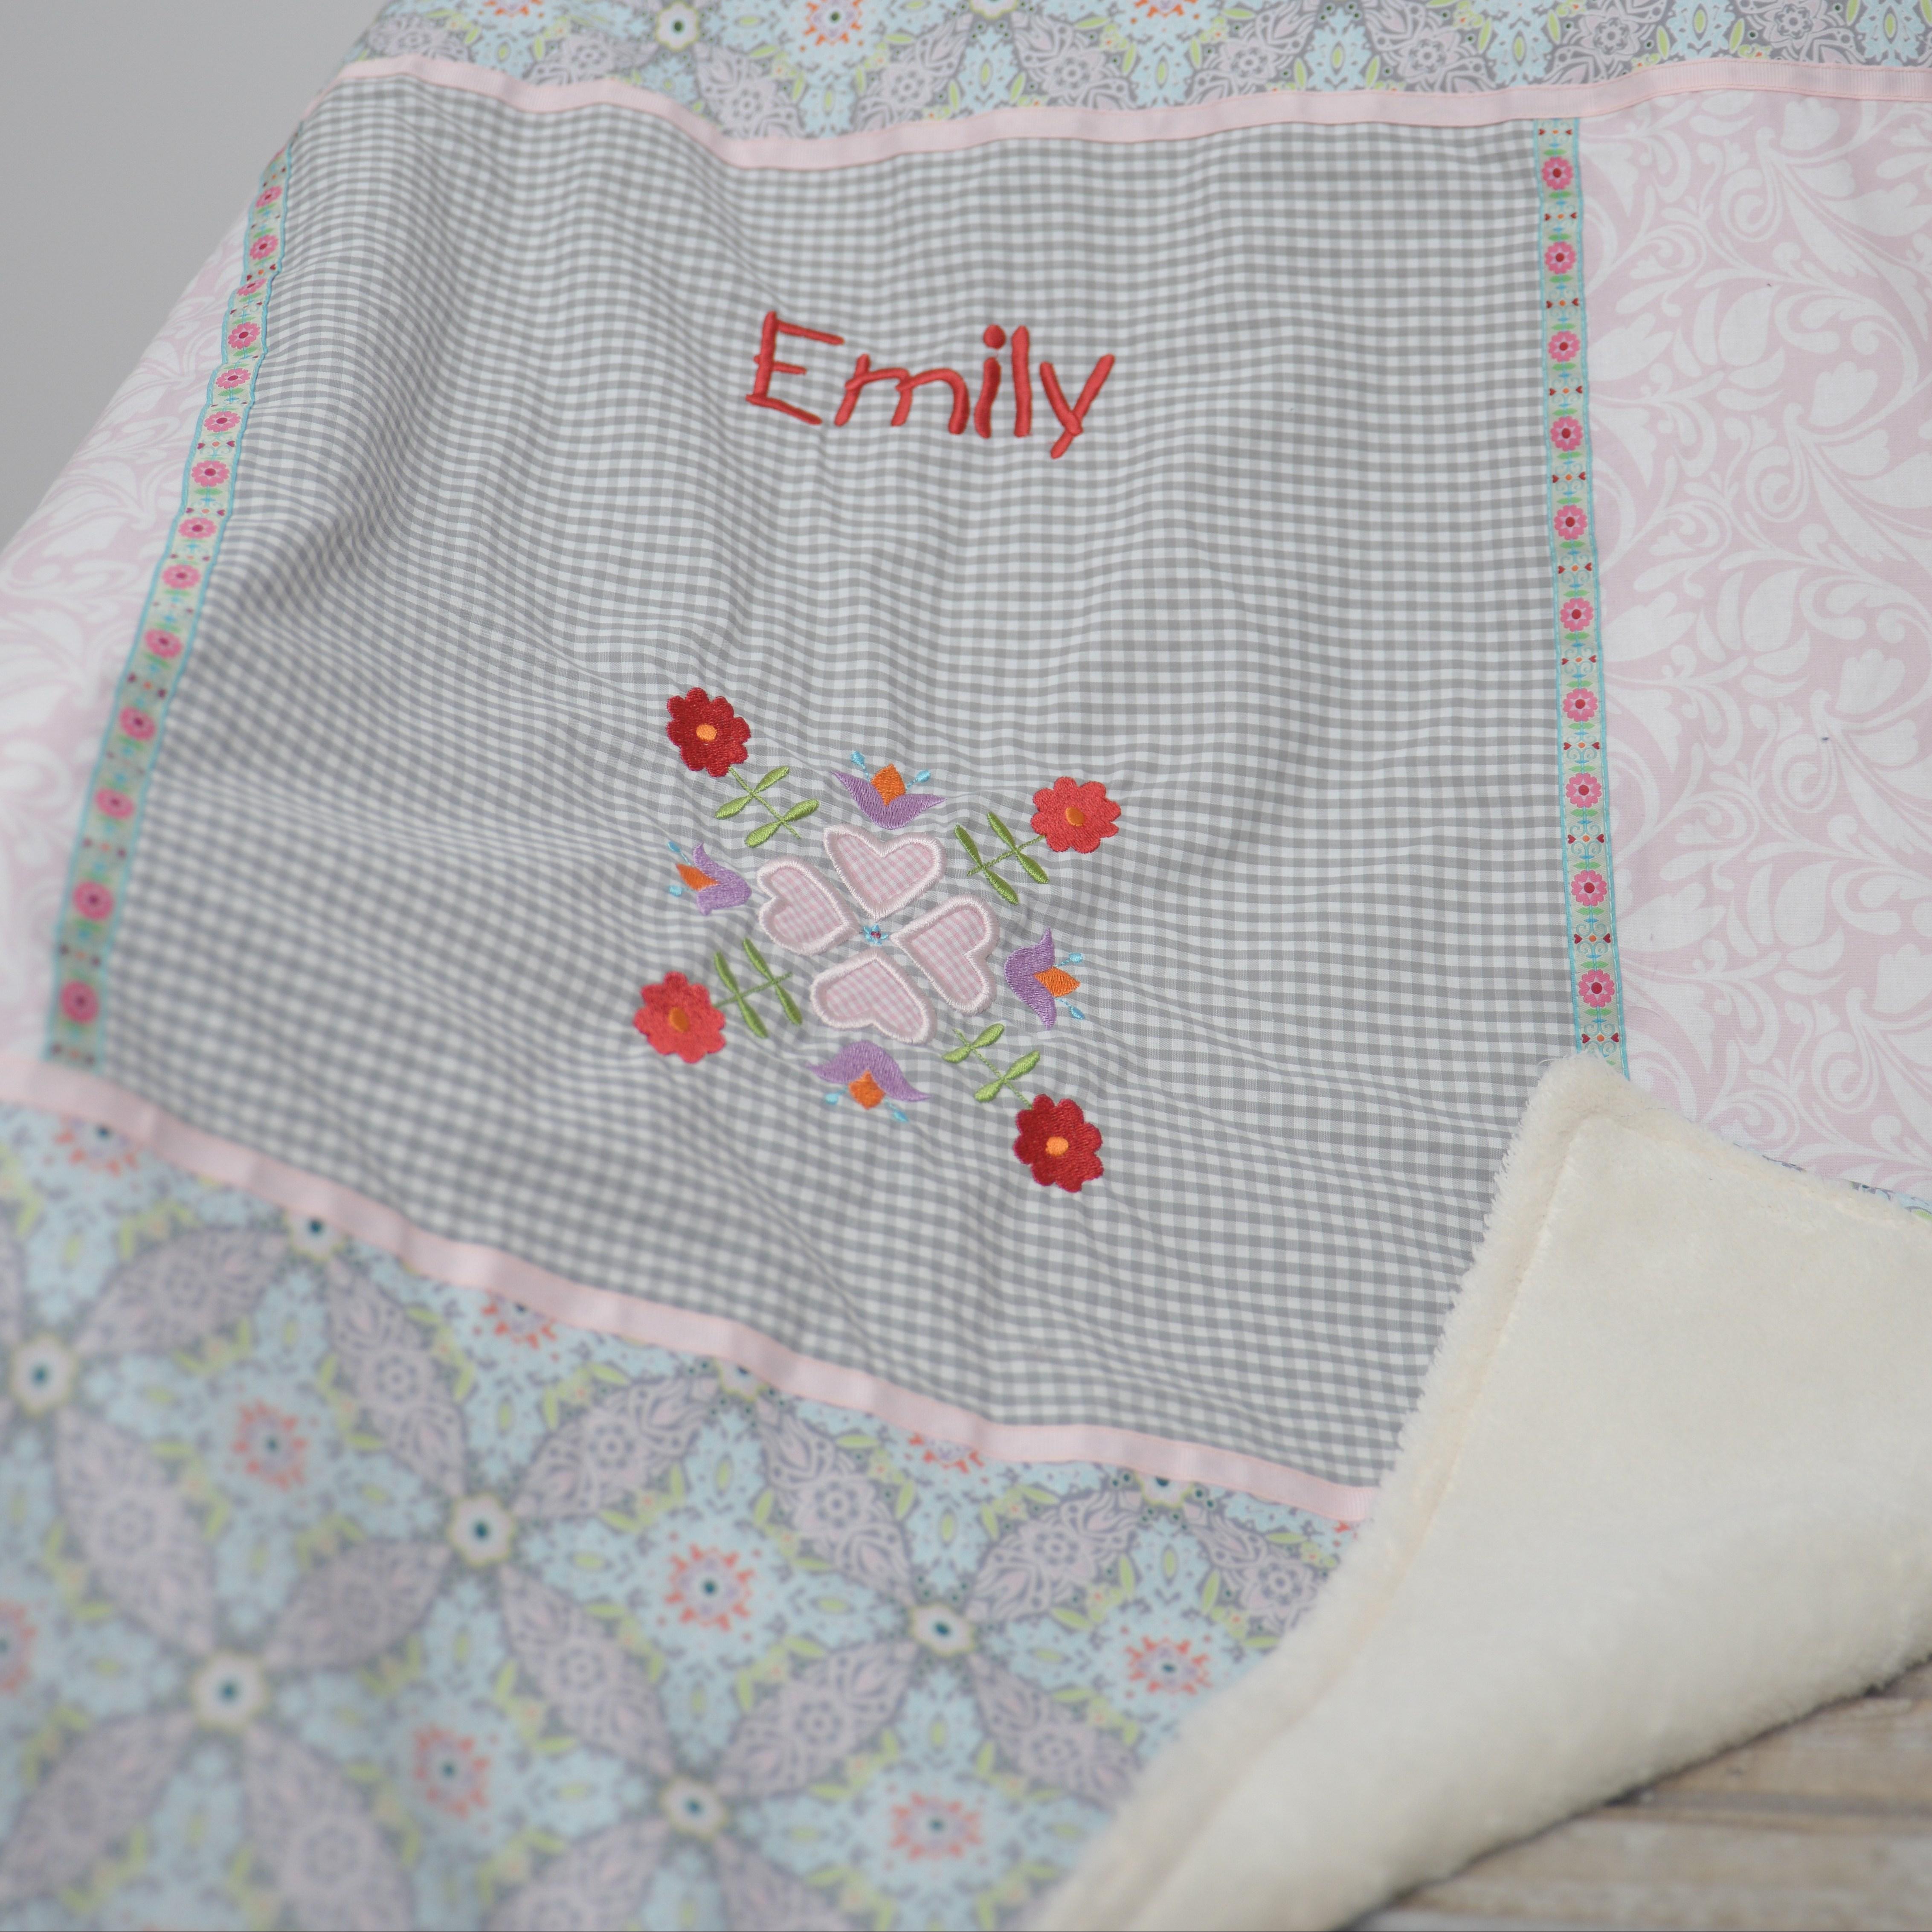 Einschlagdecke EMILY